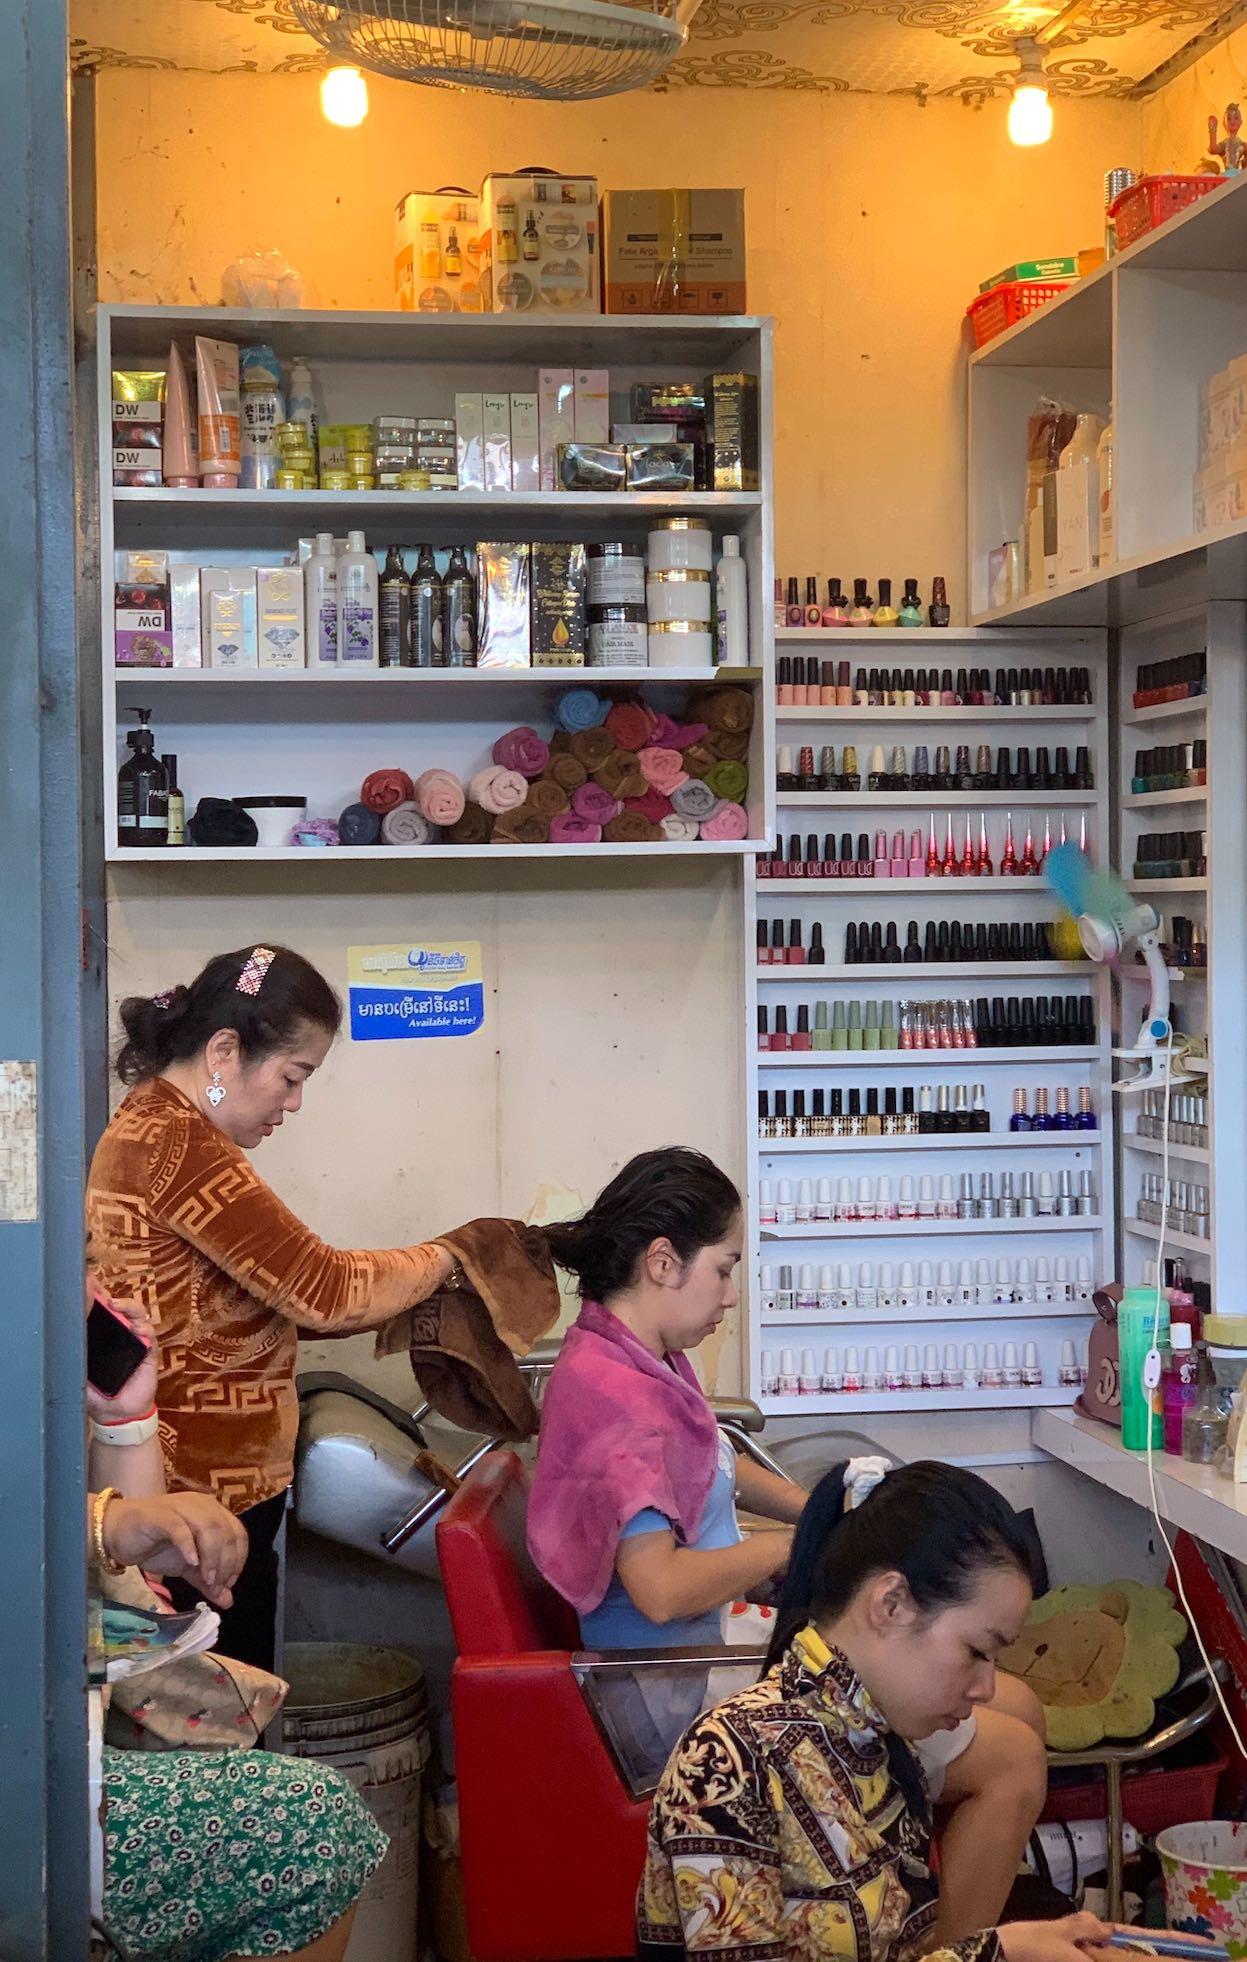 Hairdresser Phnom Penh Cambodia